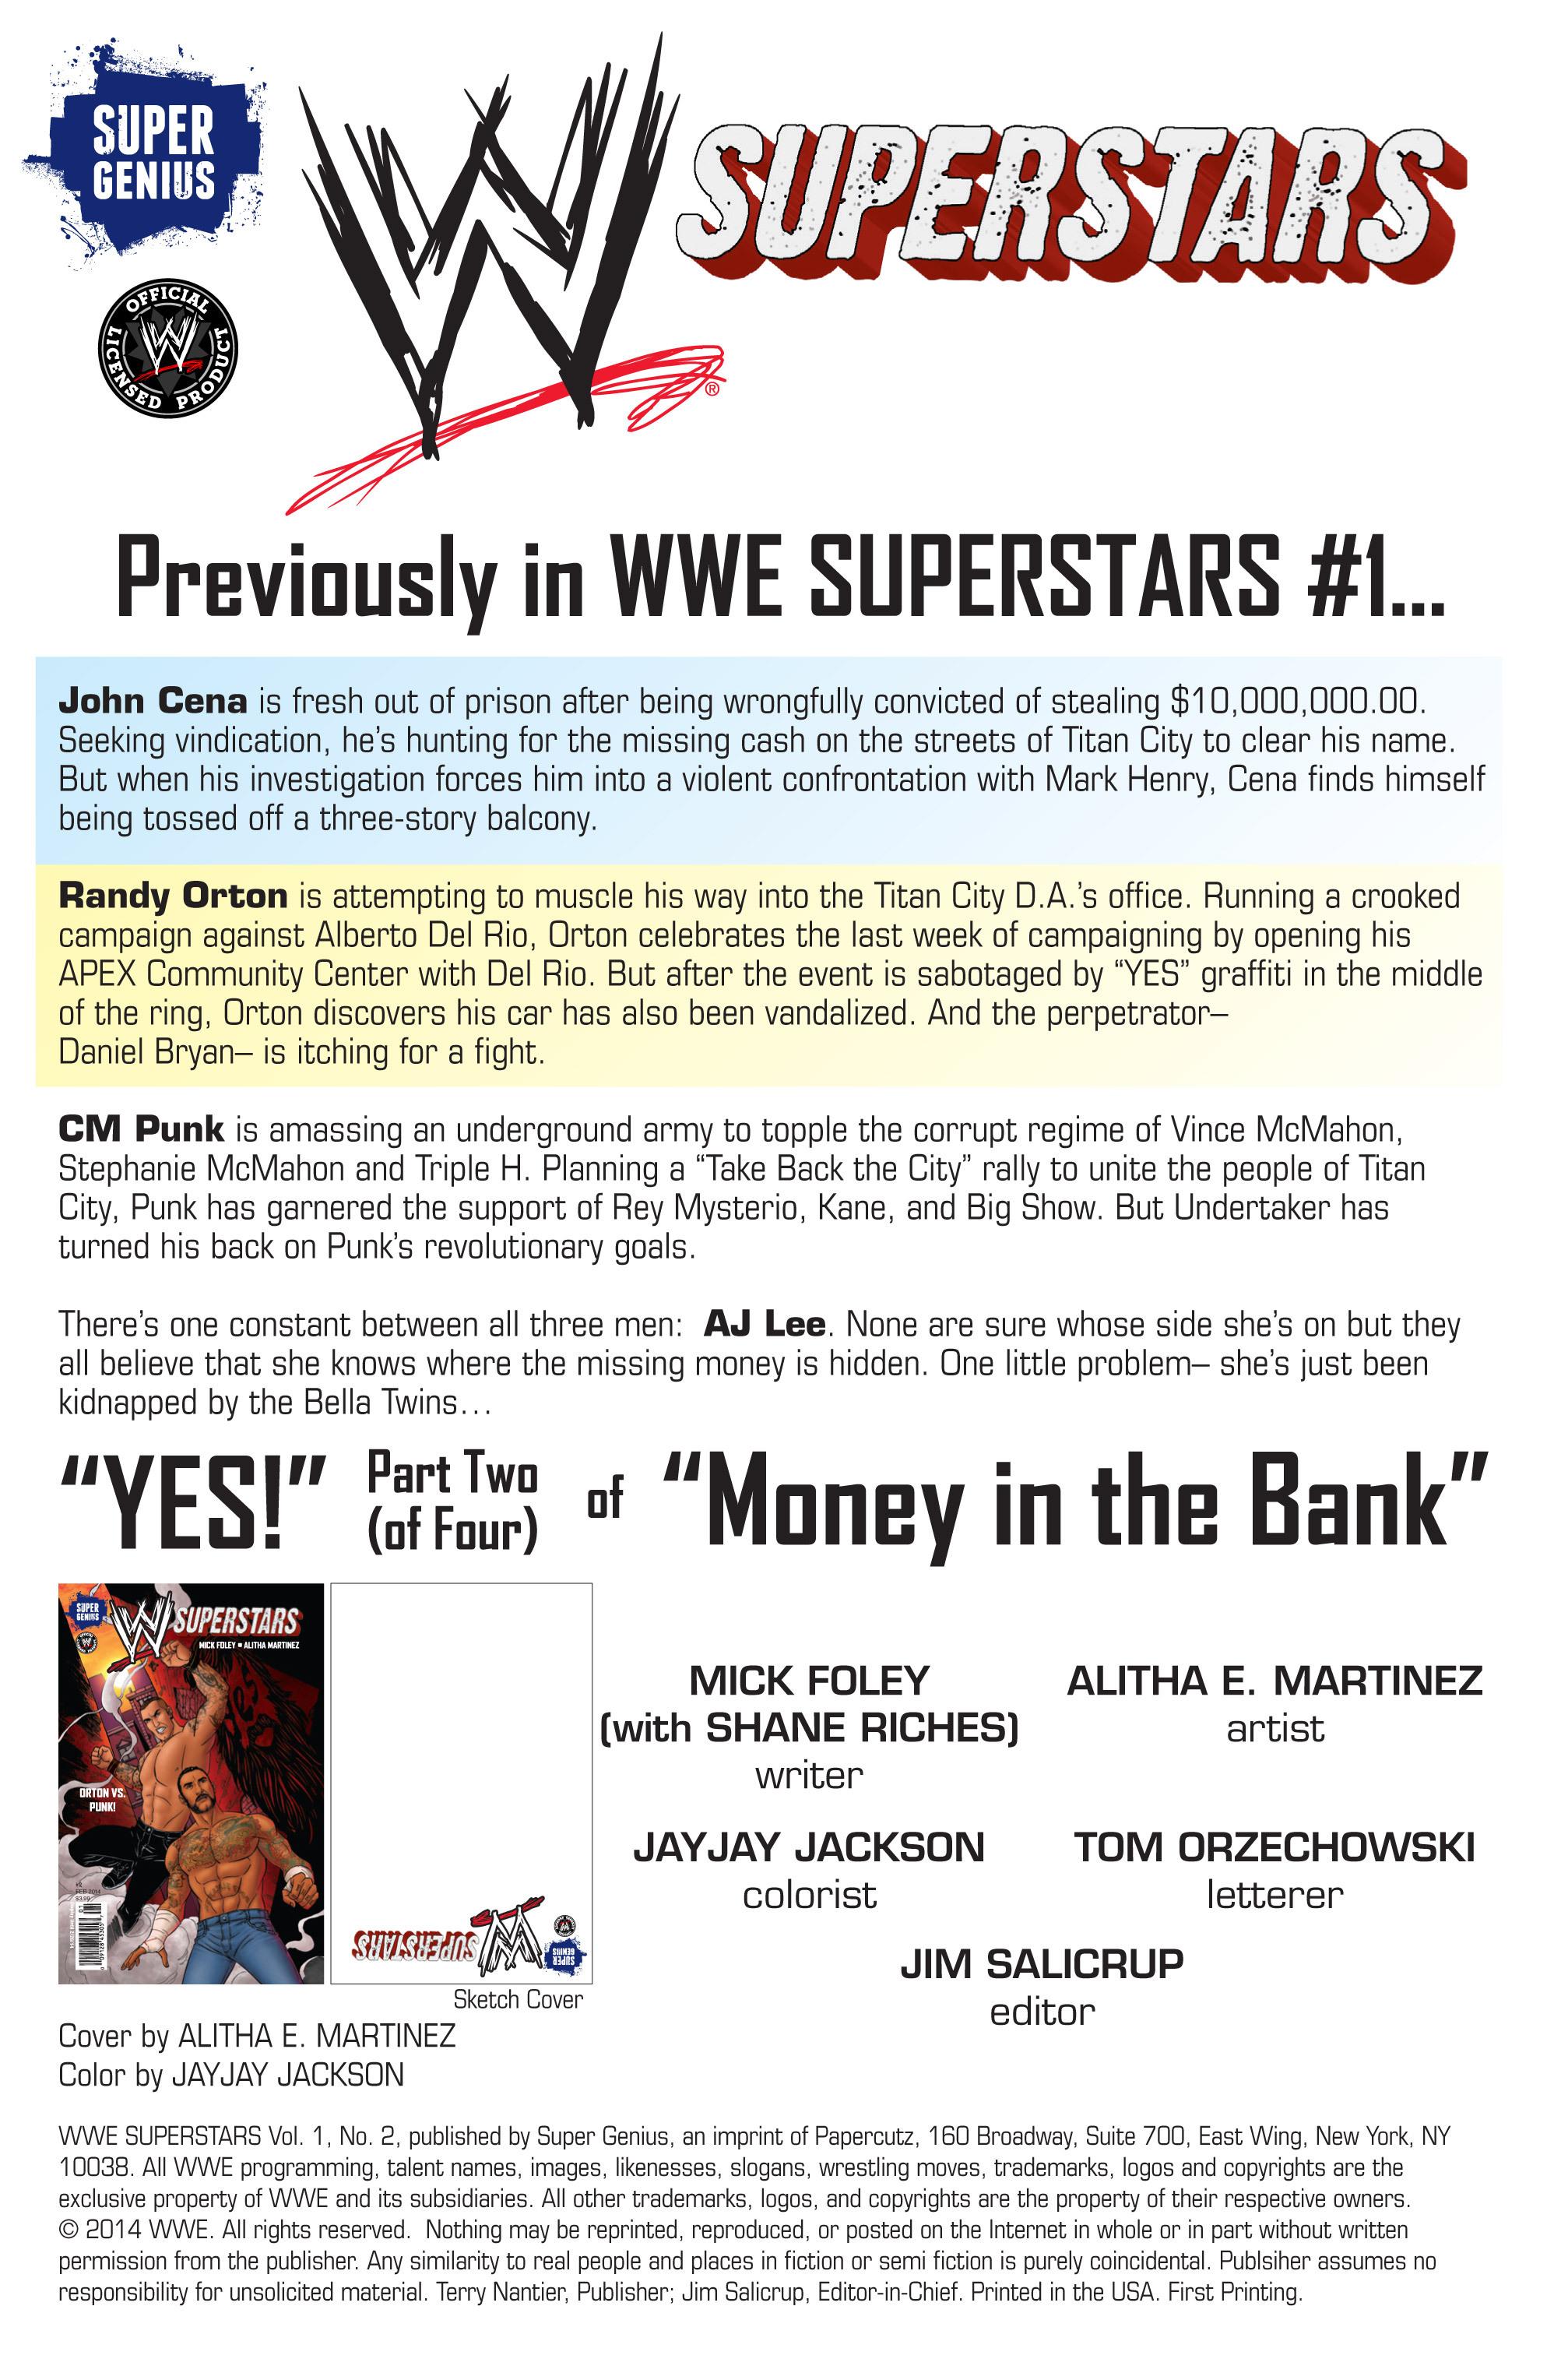 Read online WWE Superstars comic -  Issue #2 - 2